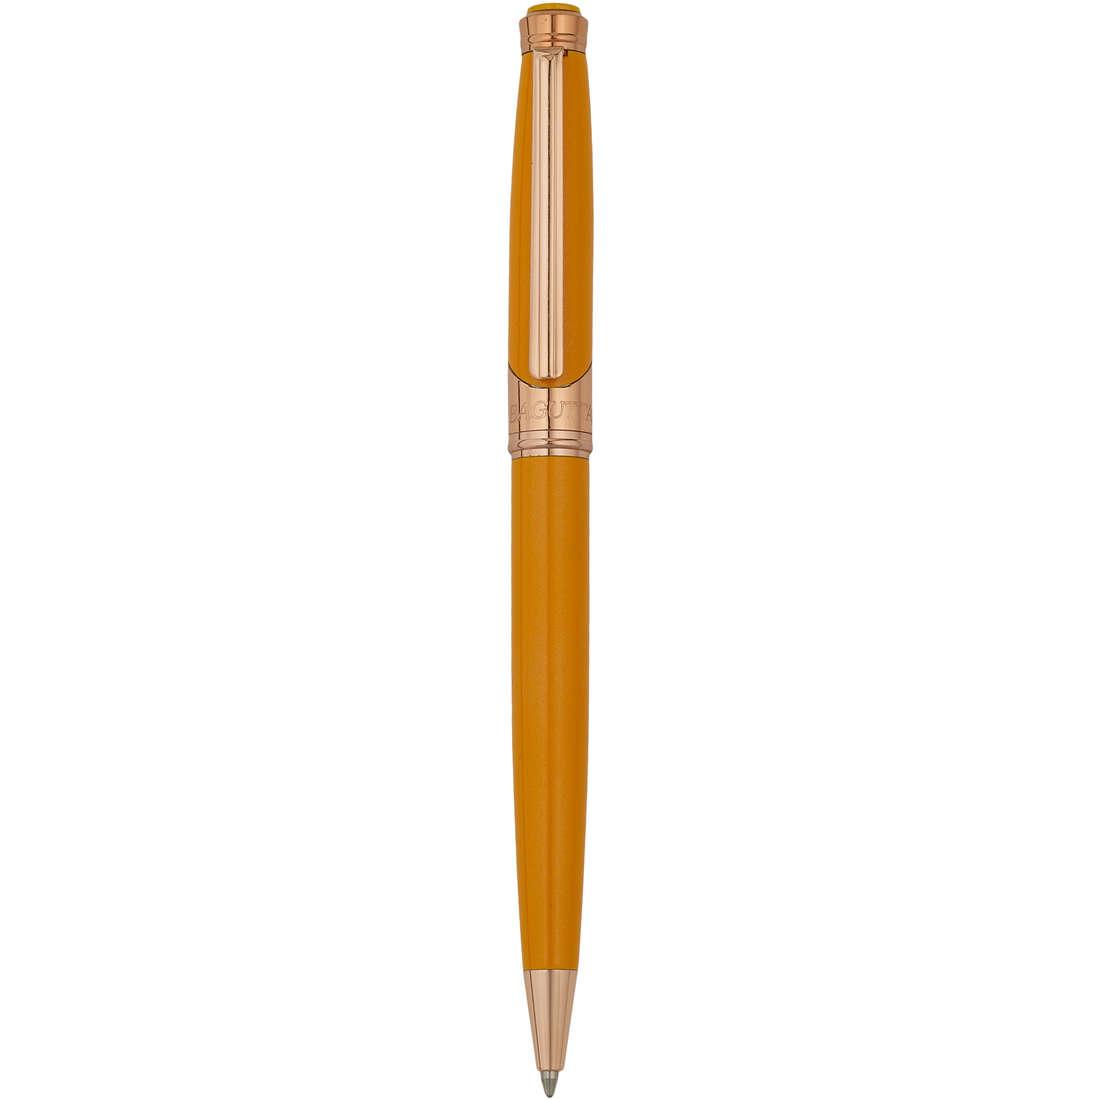 stylo unisex bijoux Bagutta H 6009-03 B